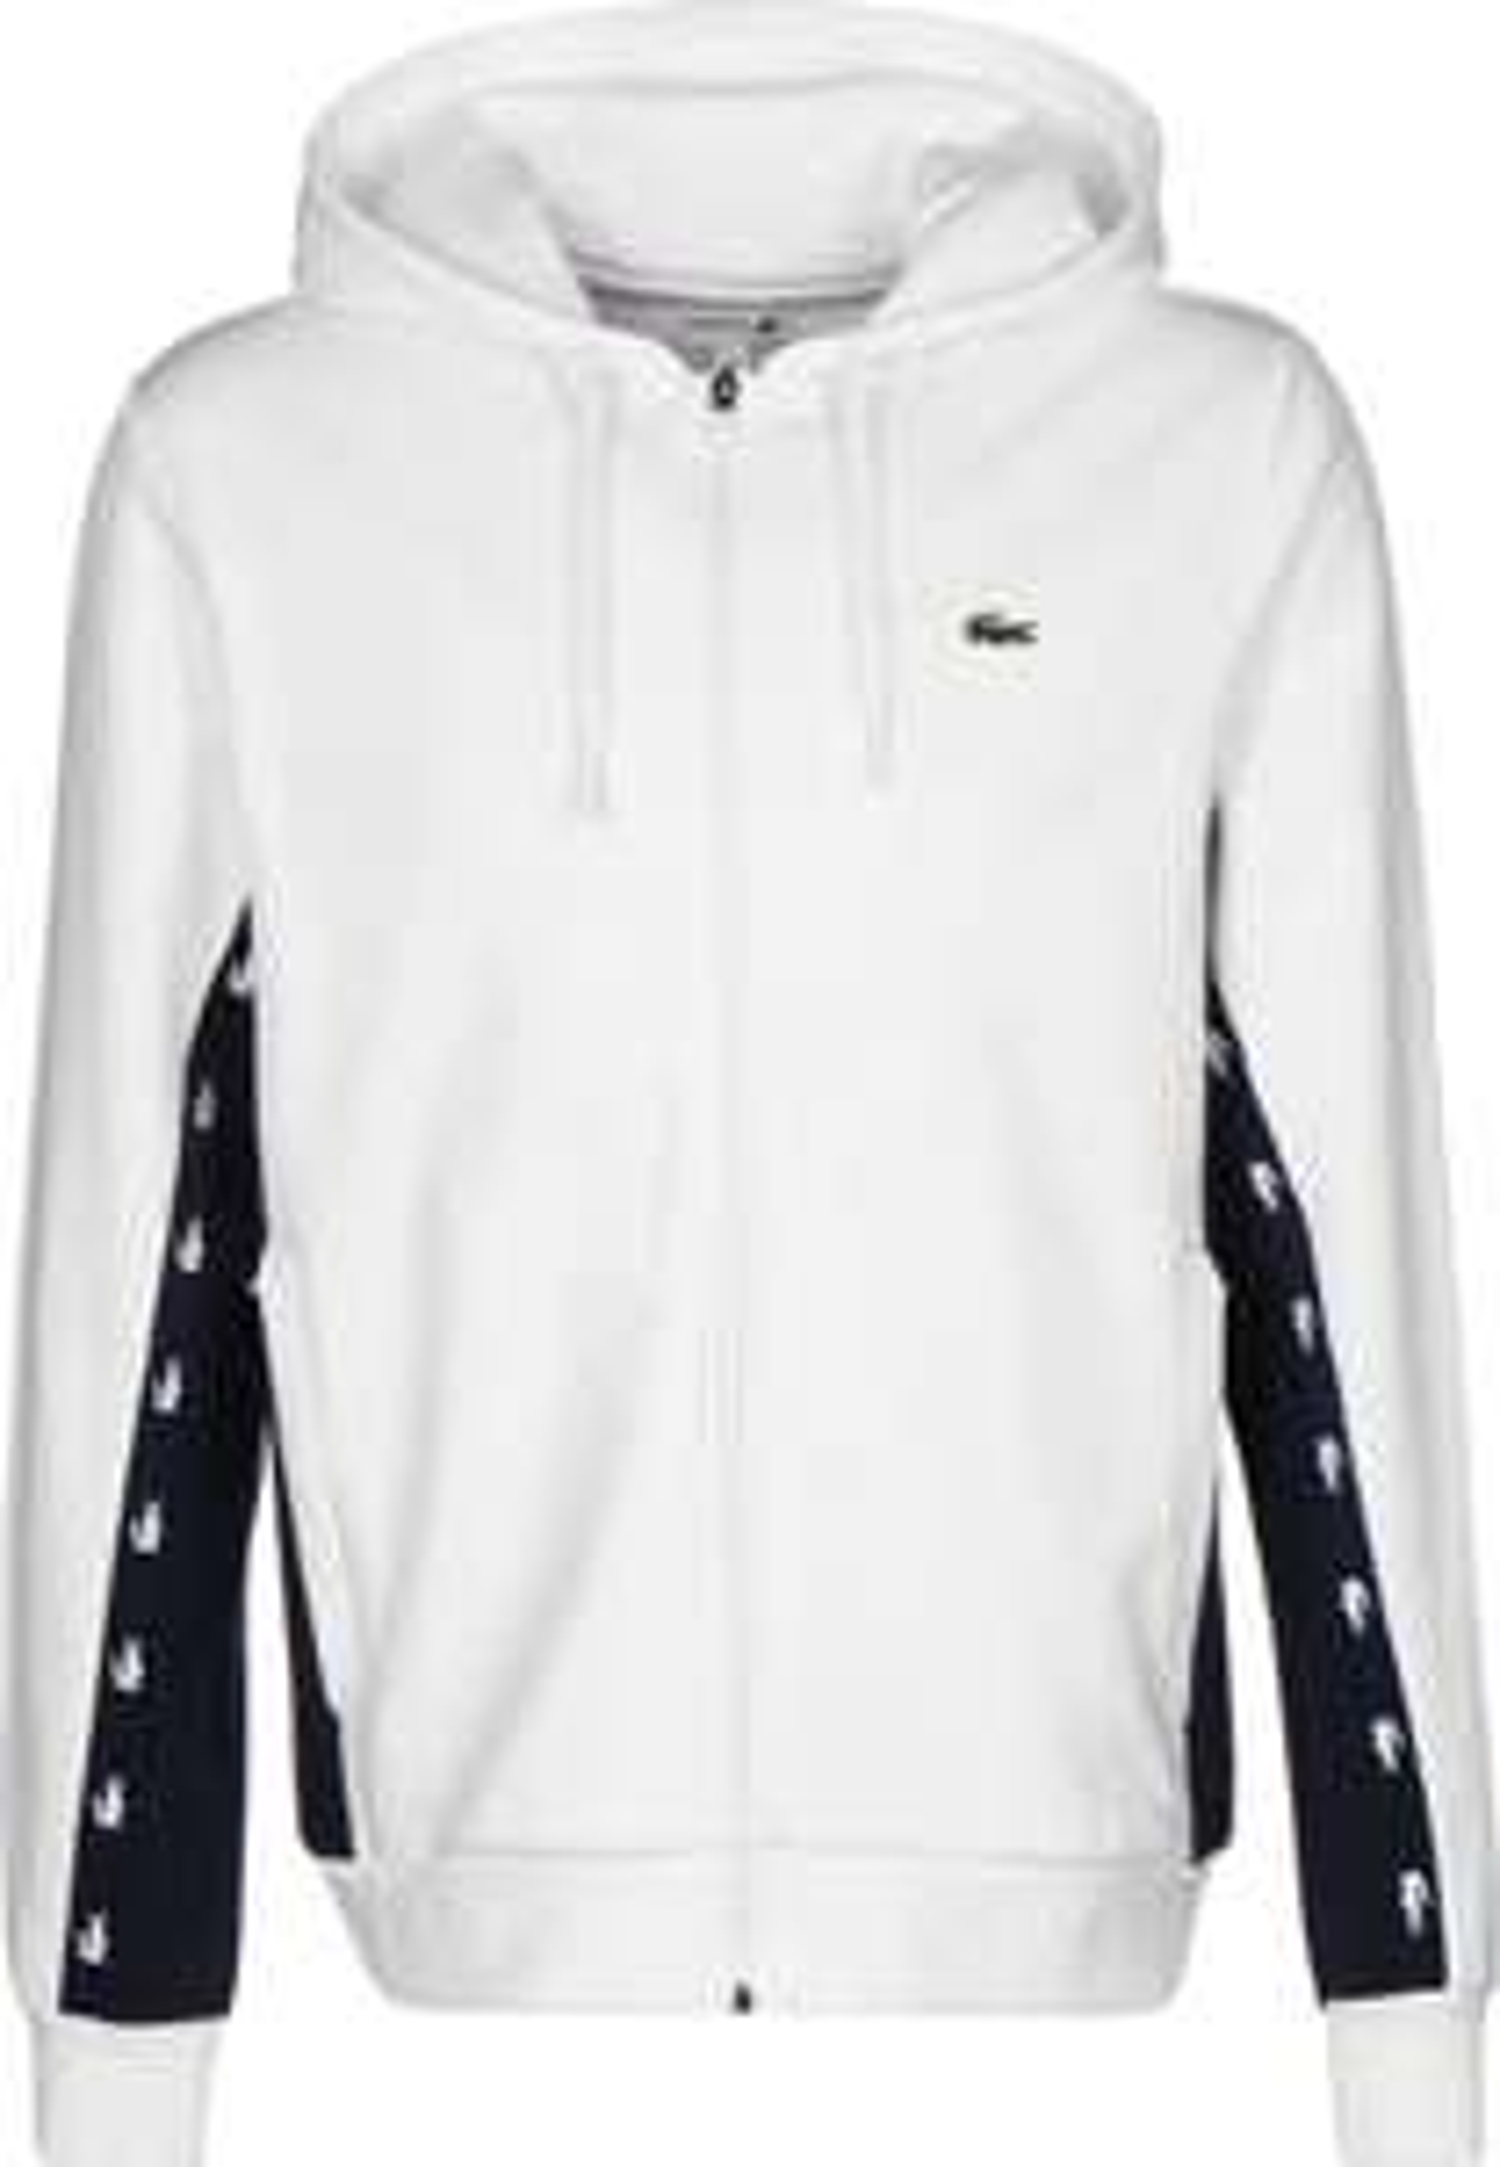 Lacoste Sweatshirt white (M - XL) [Stylefile]